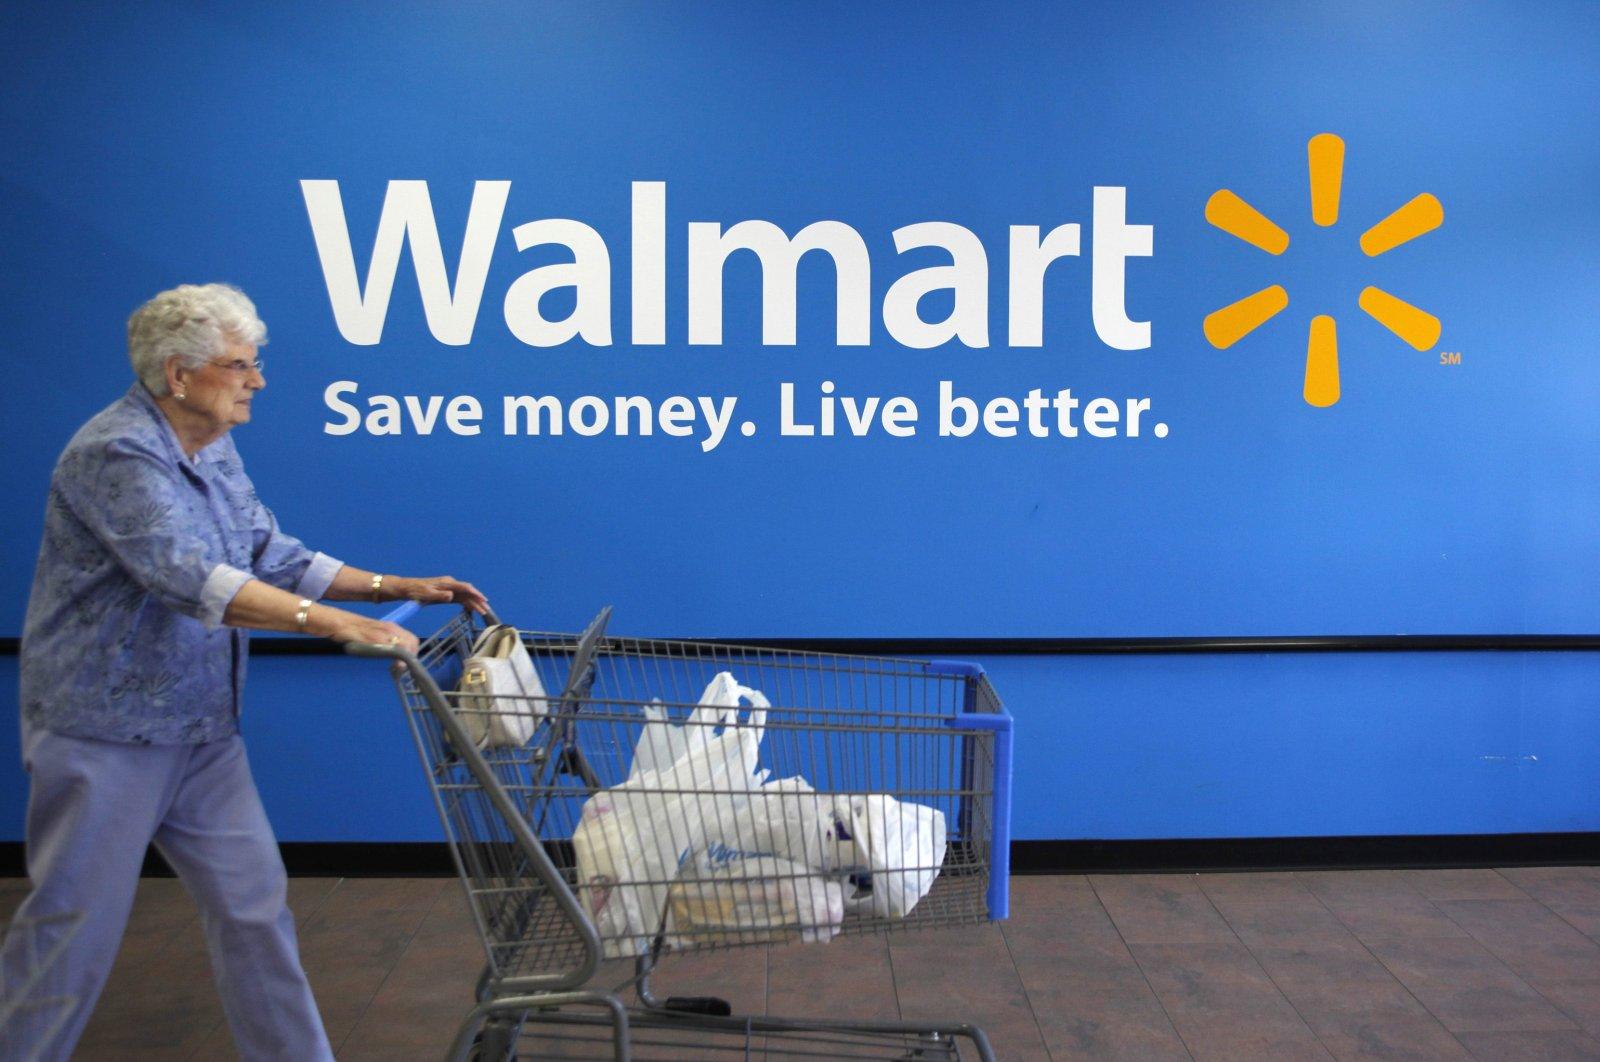 A customer leaves a Walmart store in Rogers, Arkansas, U.S., June 4, 2009.  (Reuters Photo)